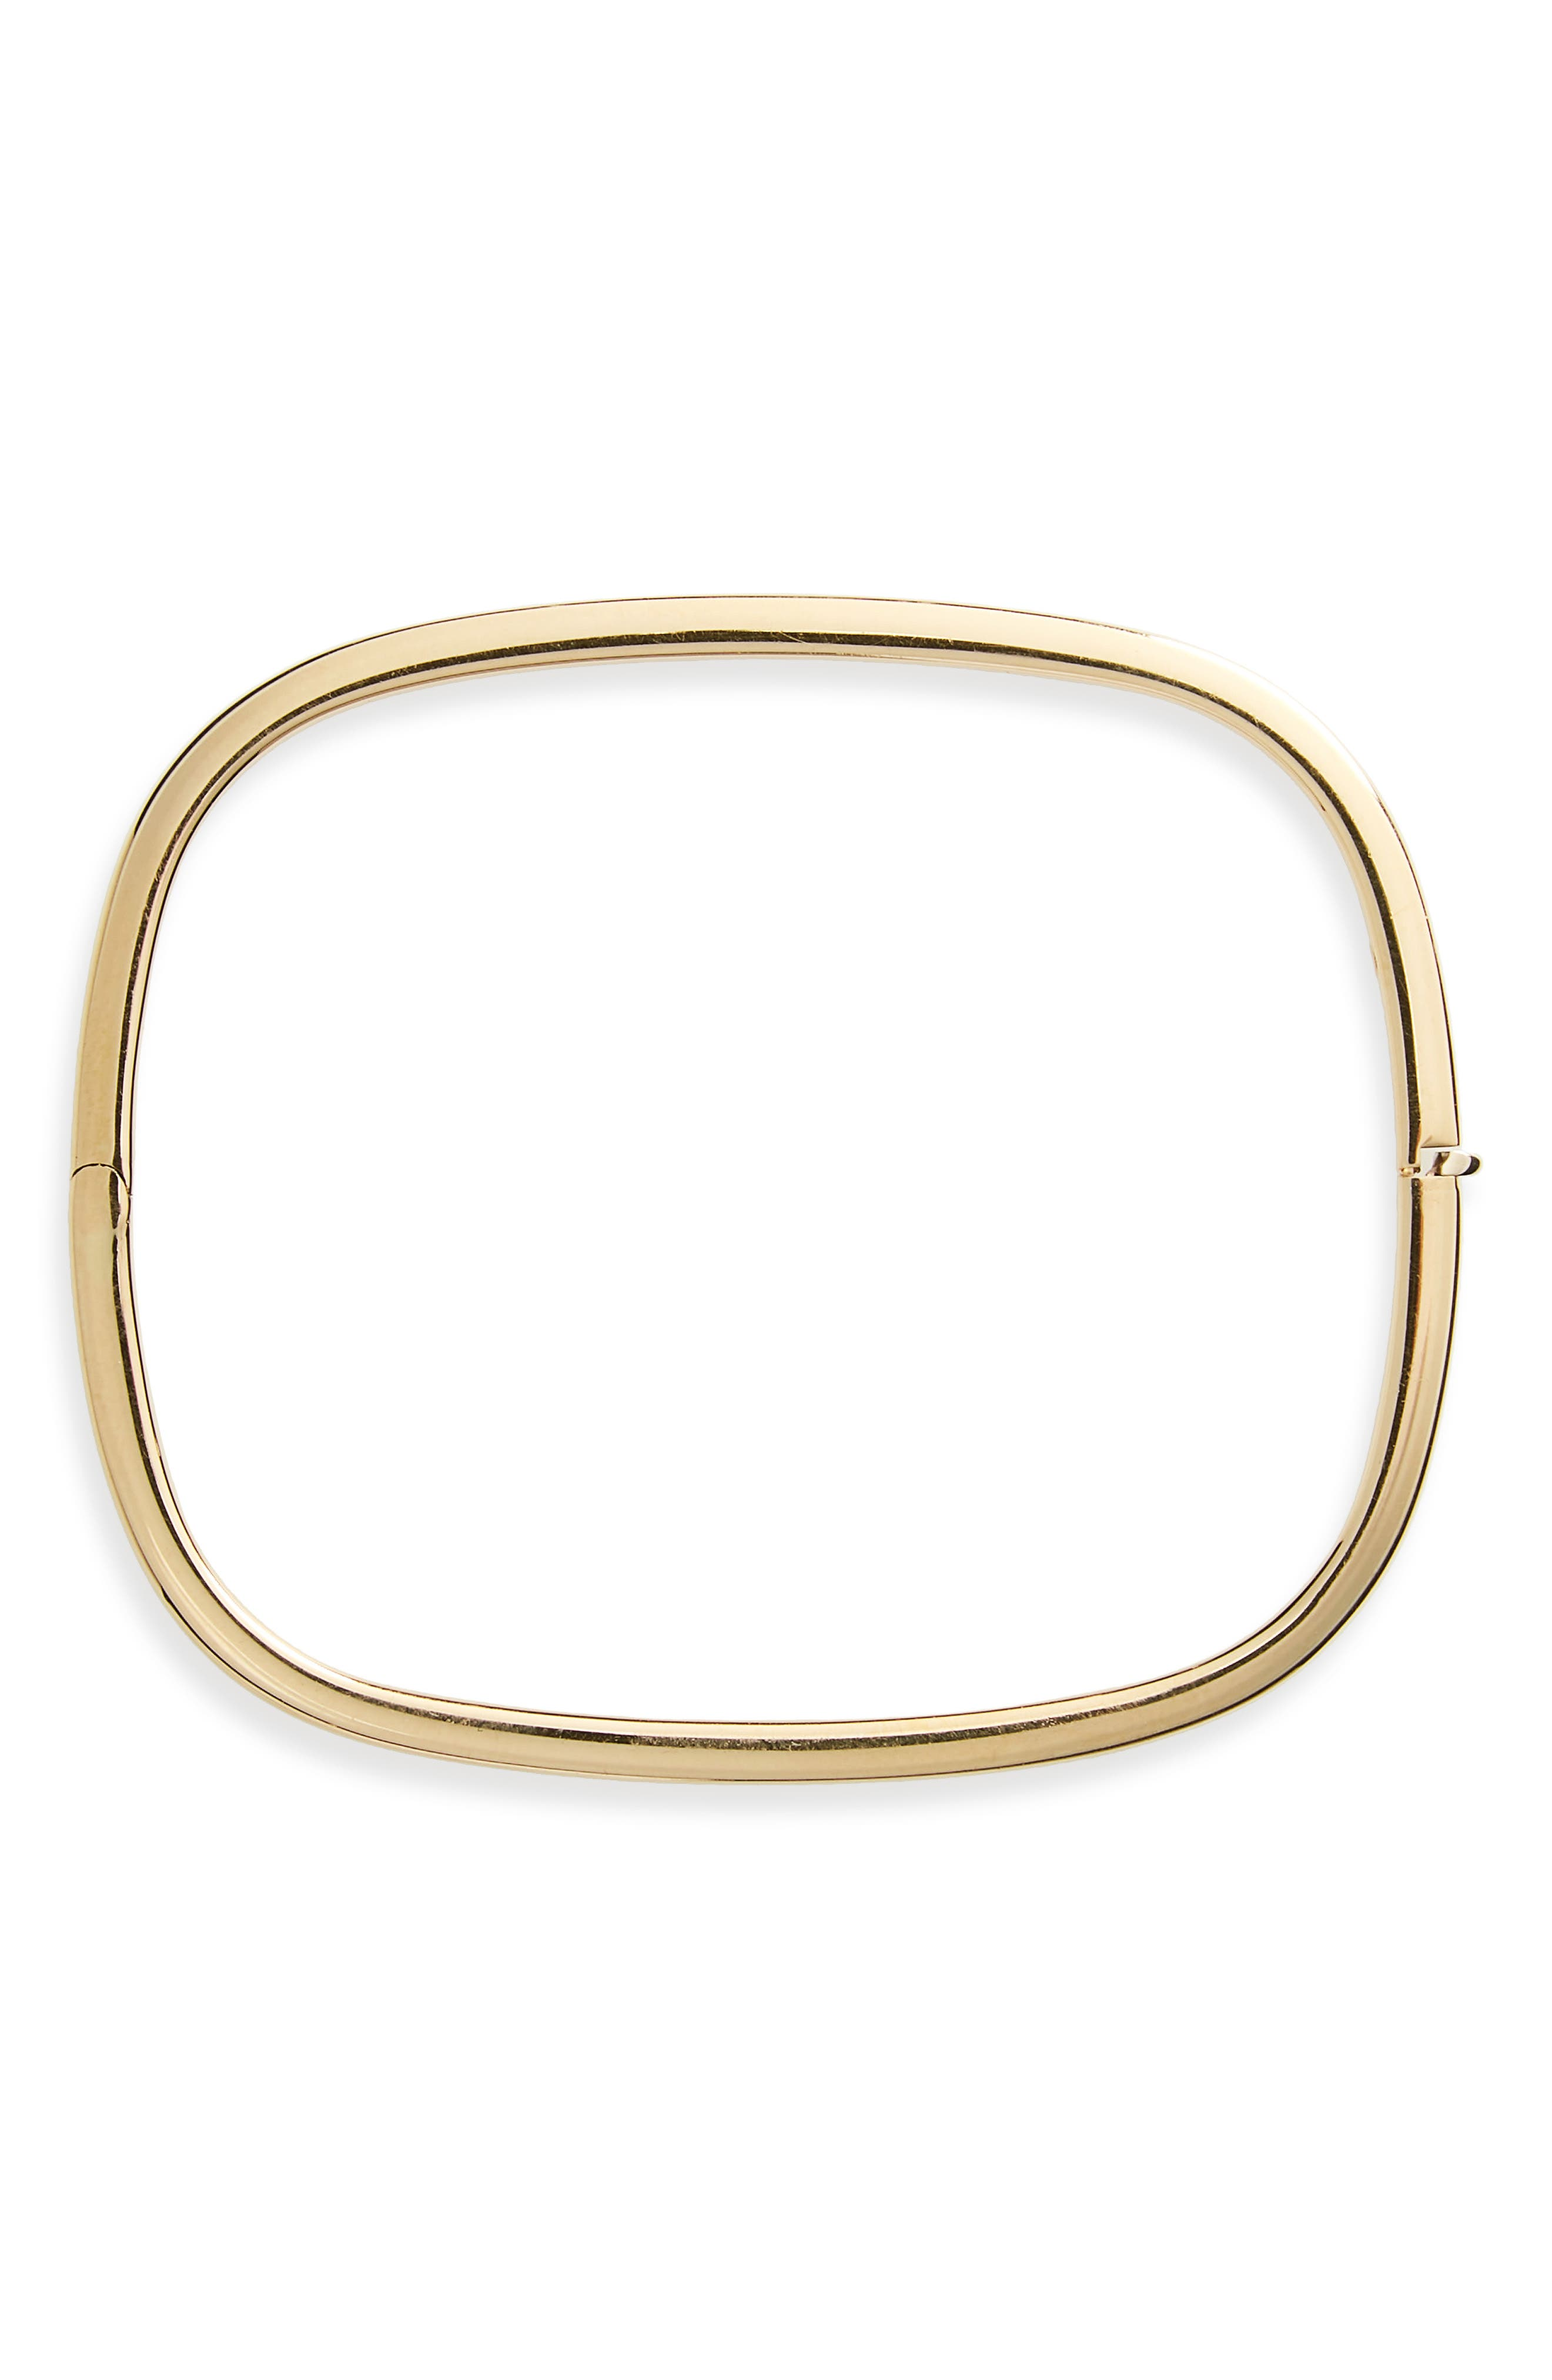 Soft Square Bangle Bracelet,                         Main,                         color,